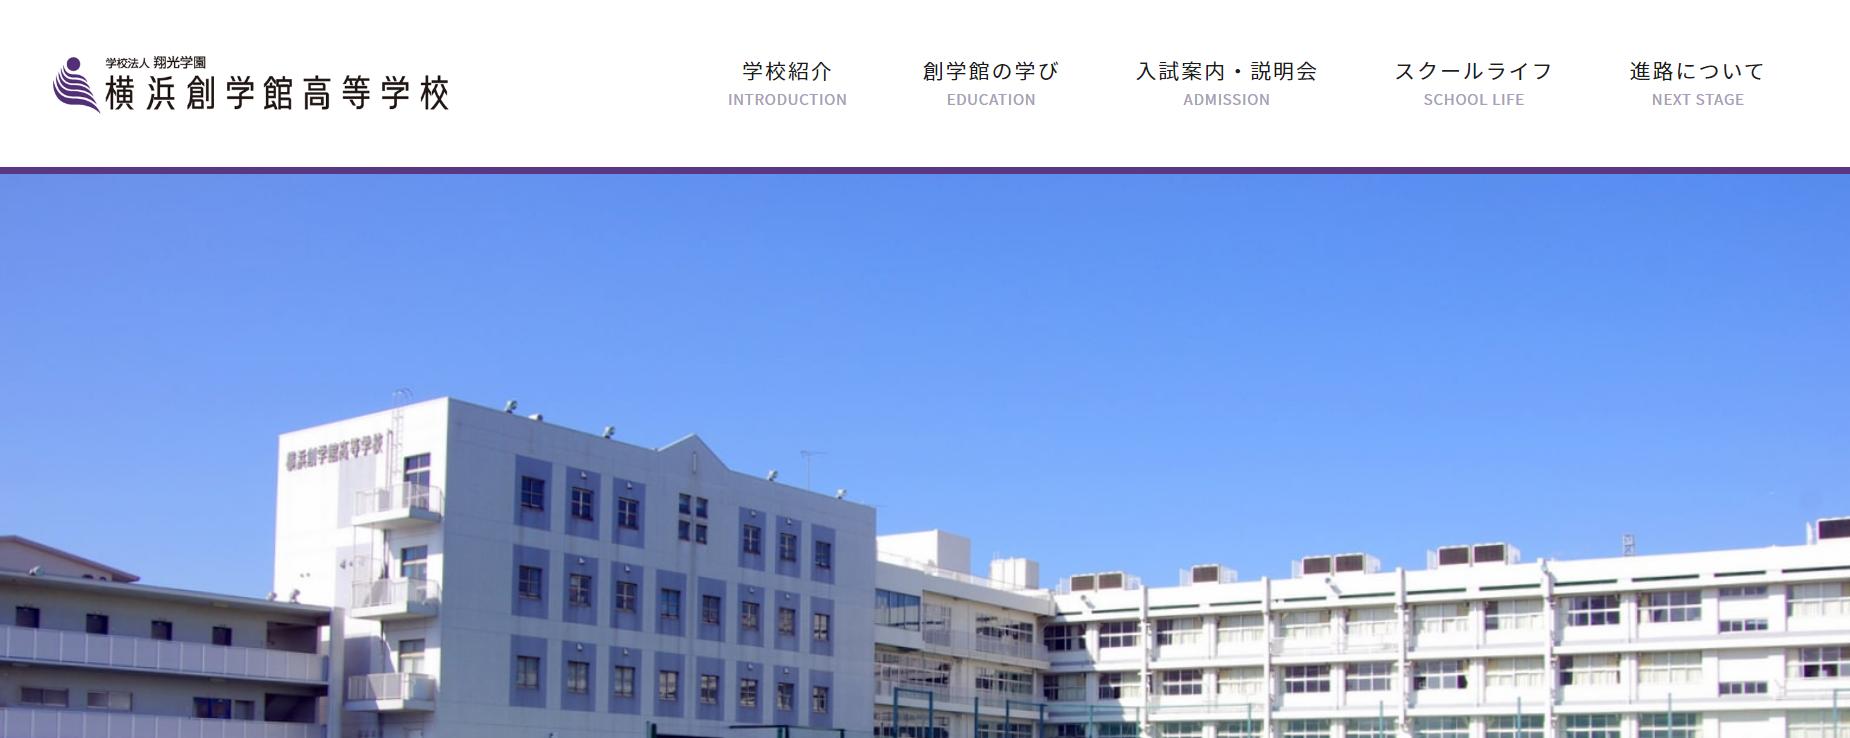 横浜創学館高校の口コミ・評判